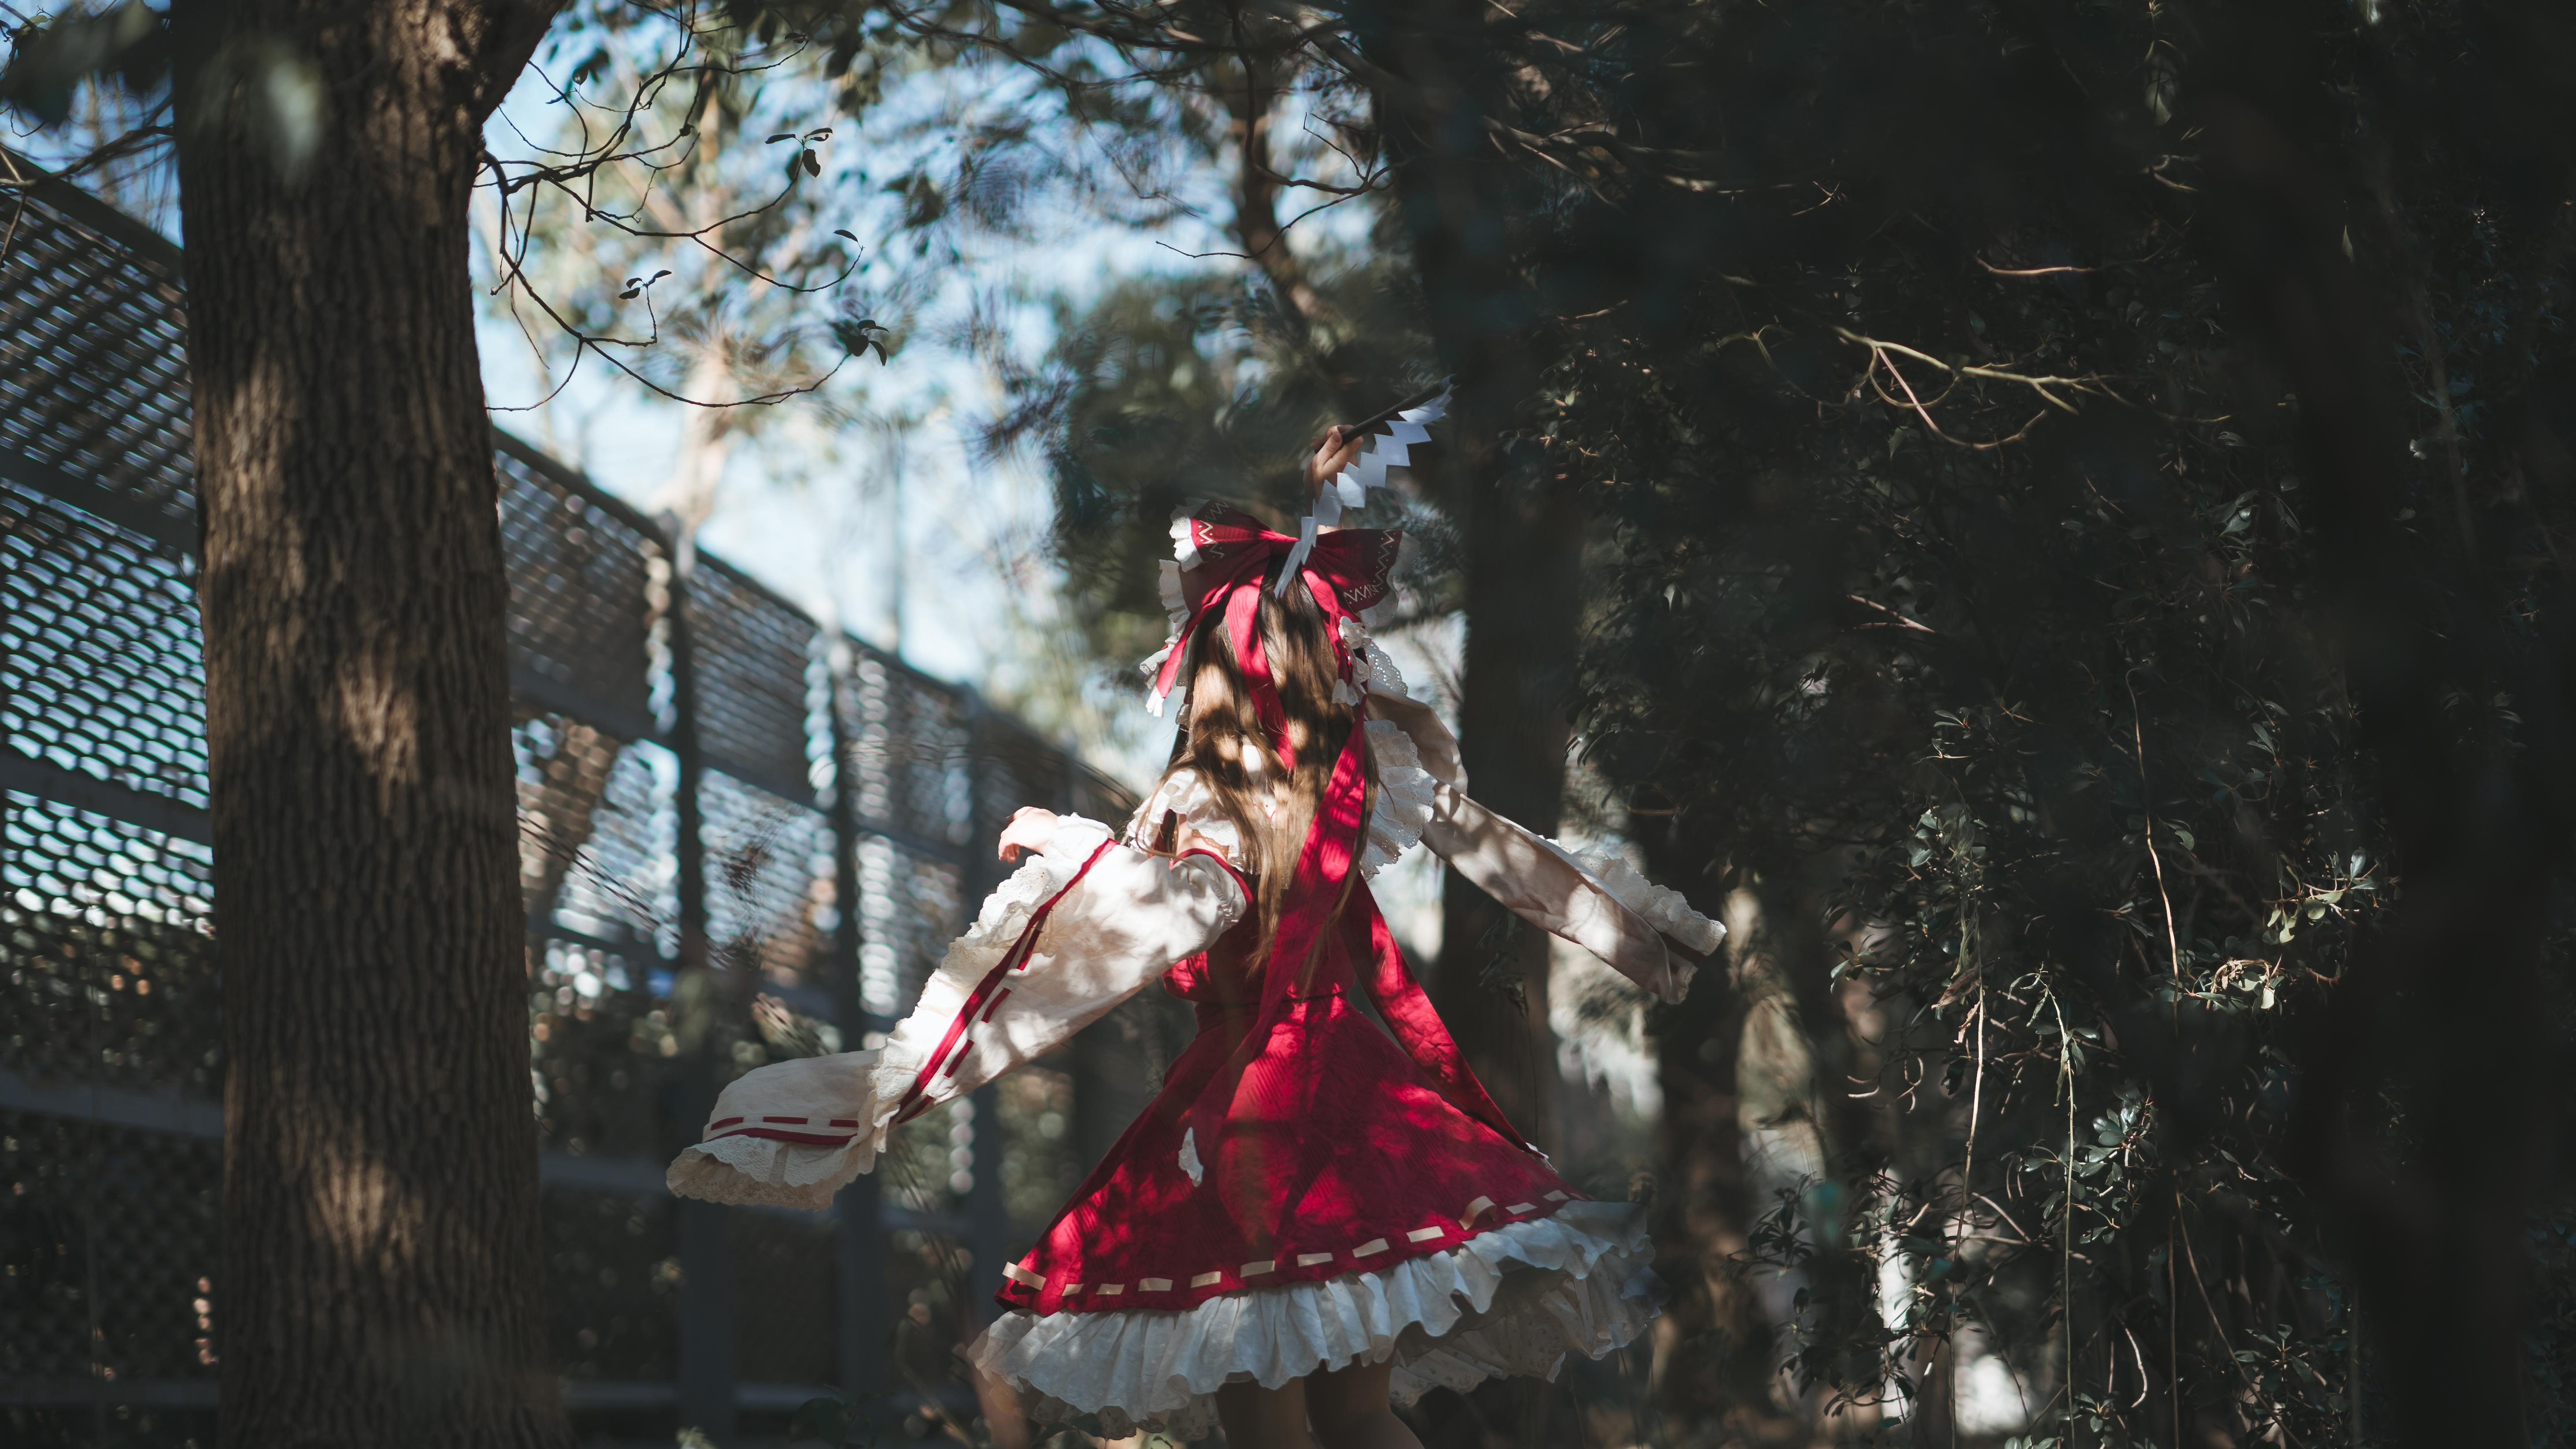 《东方PROJECT》漫展cosplay【CN:梨梨起床啊】-第5张